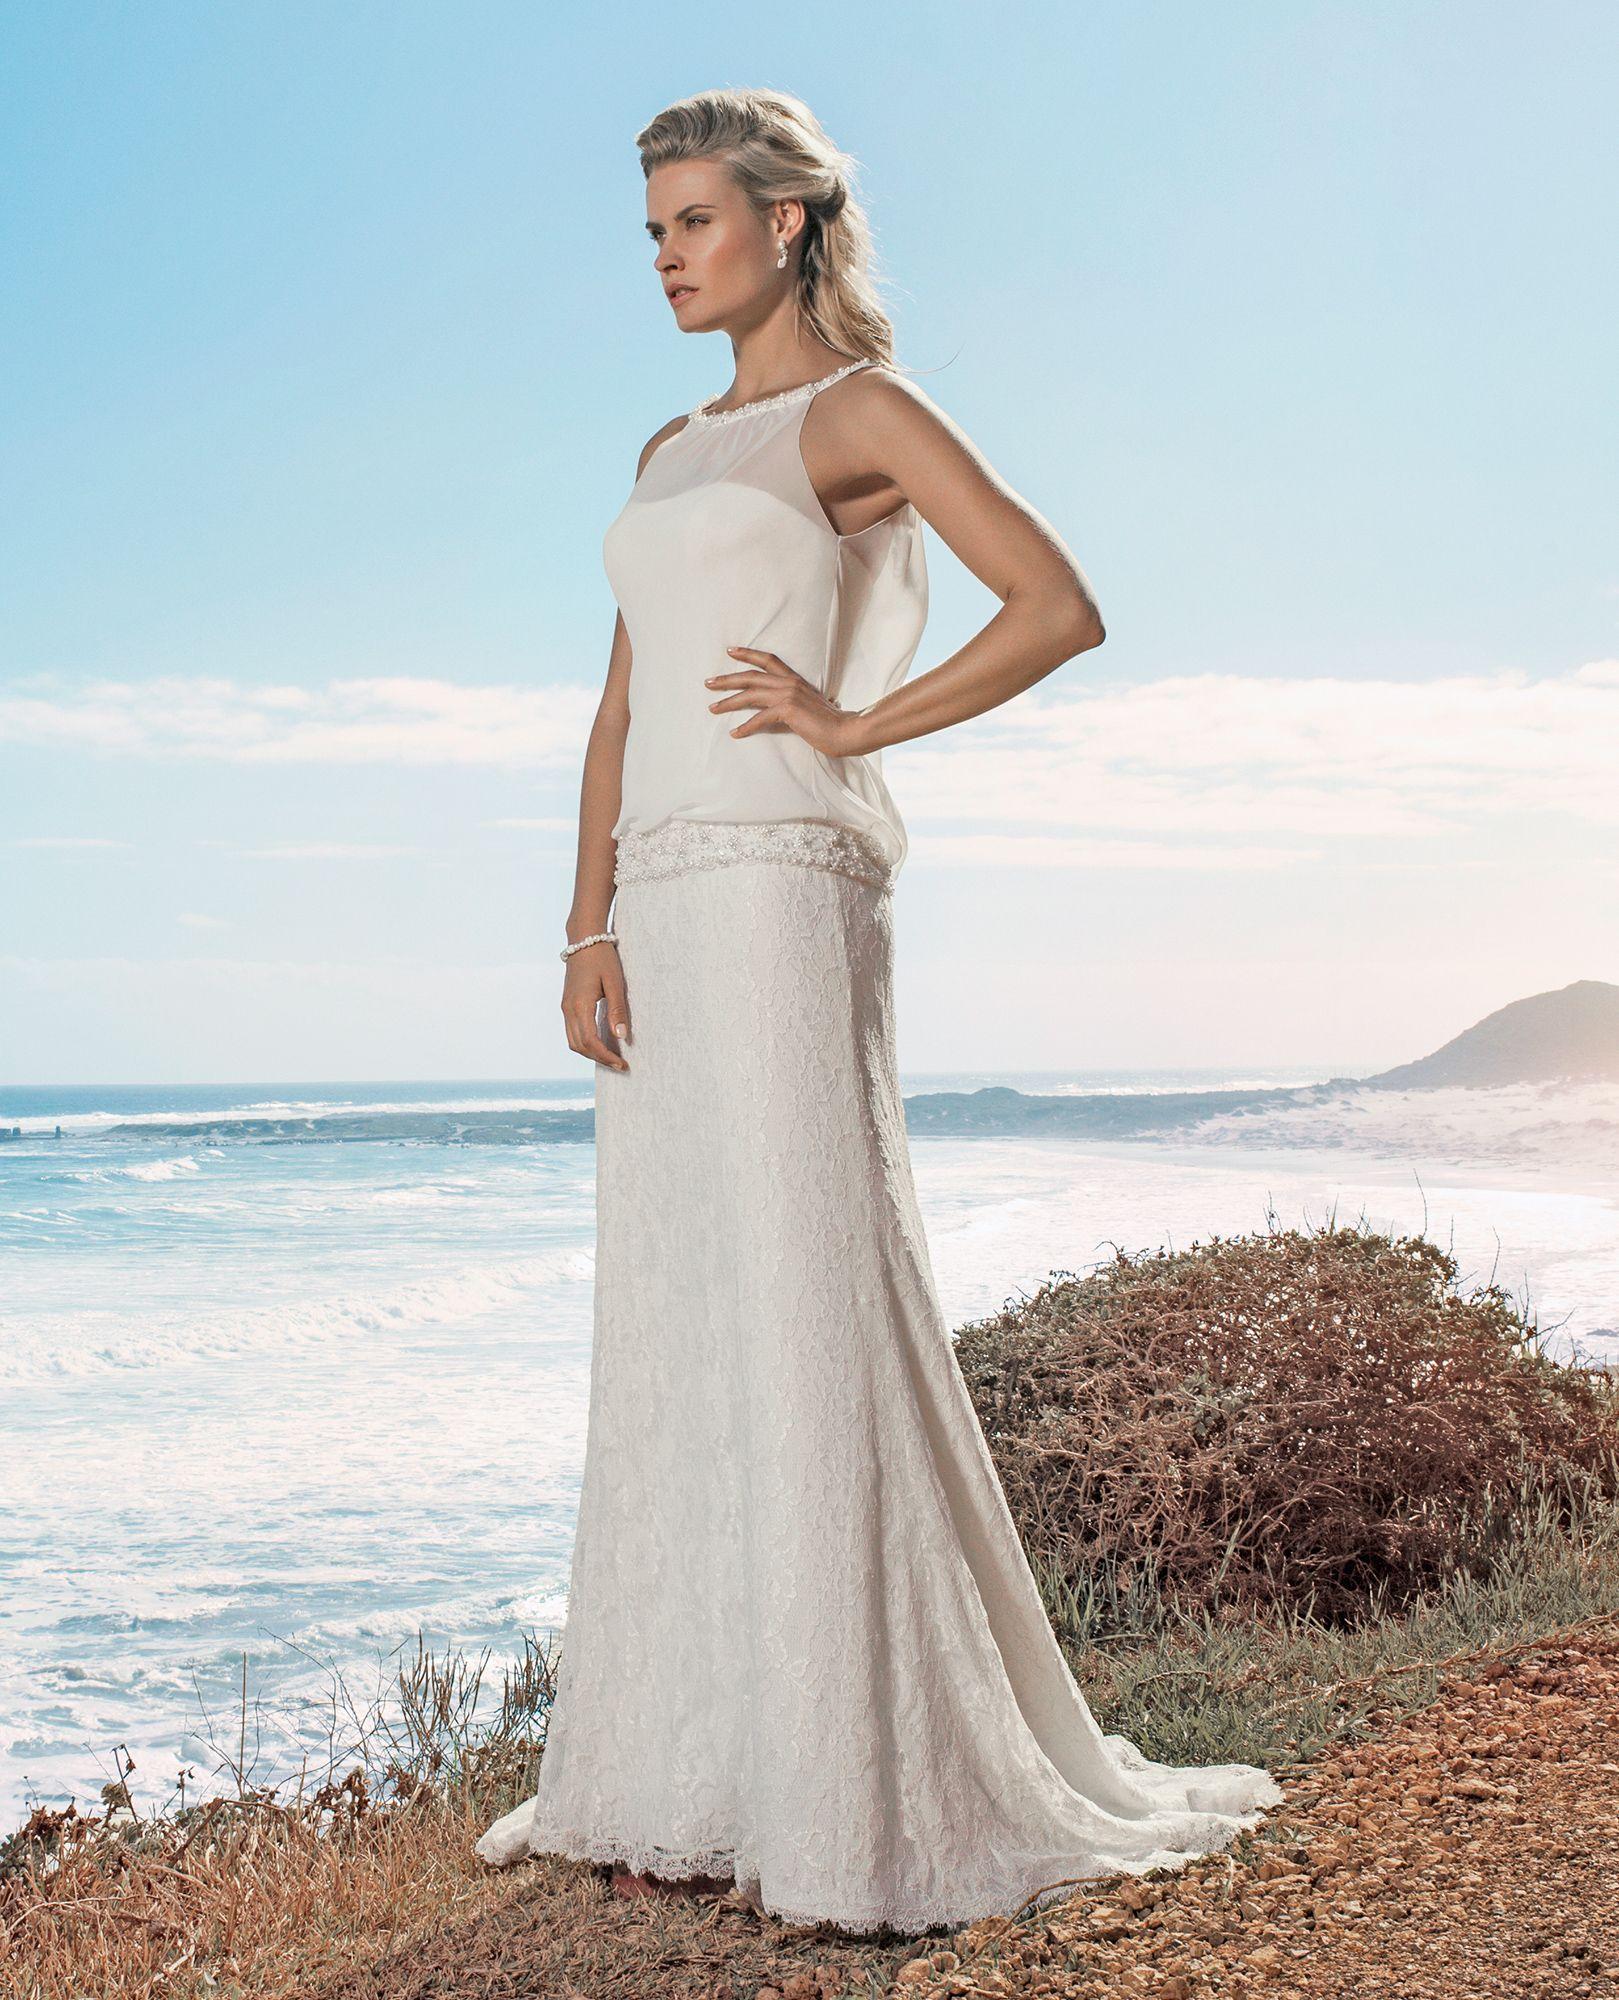 France B Pronuptia Online wedding dress, Dresses